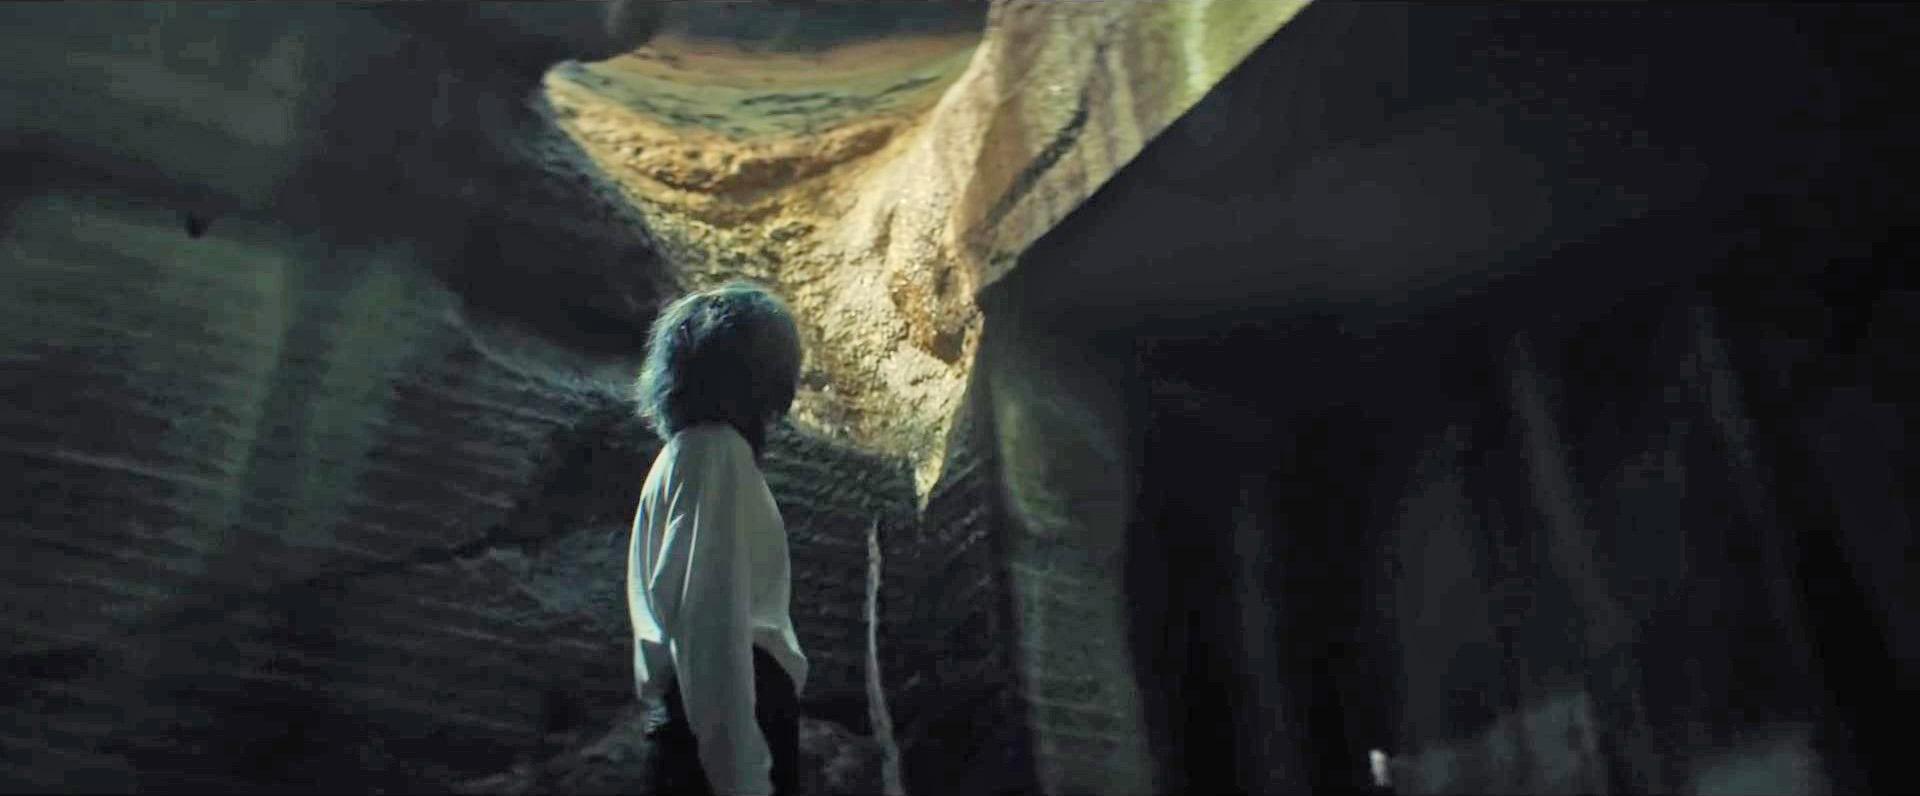 MV聖地巡礼にもオススメ!圧倒的スケールの大谷石採石場跡地。